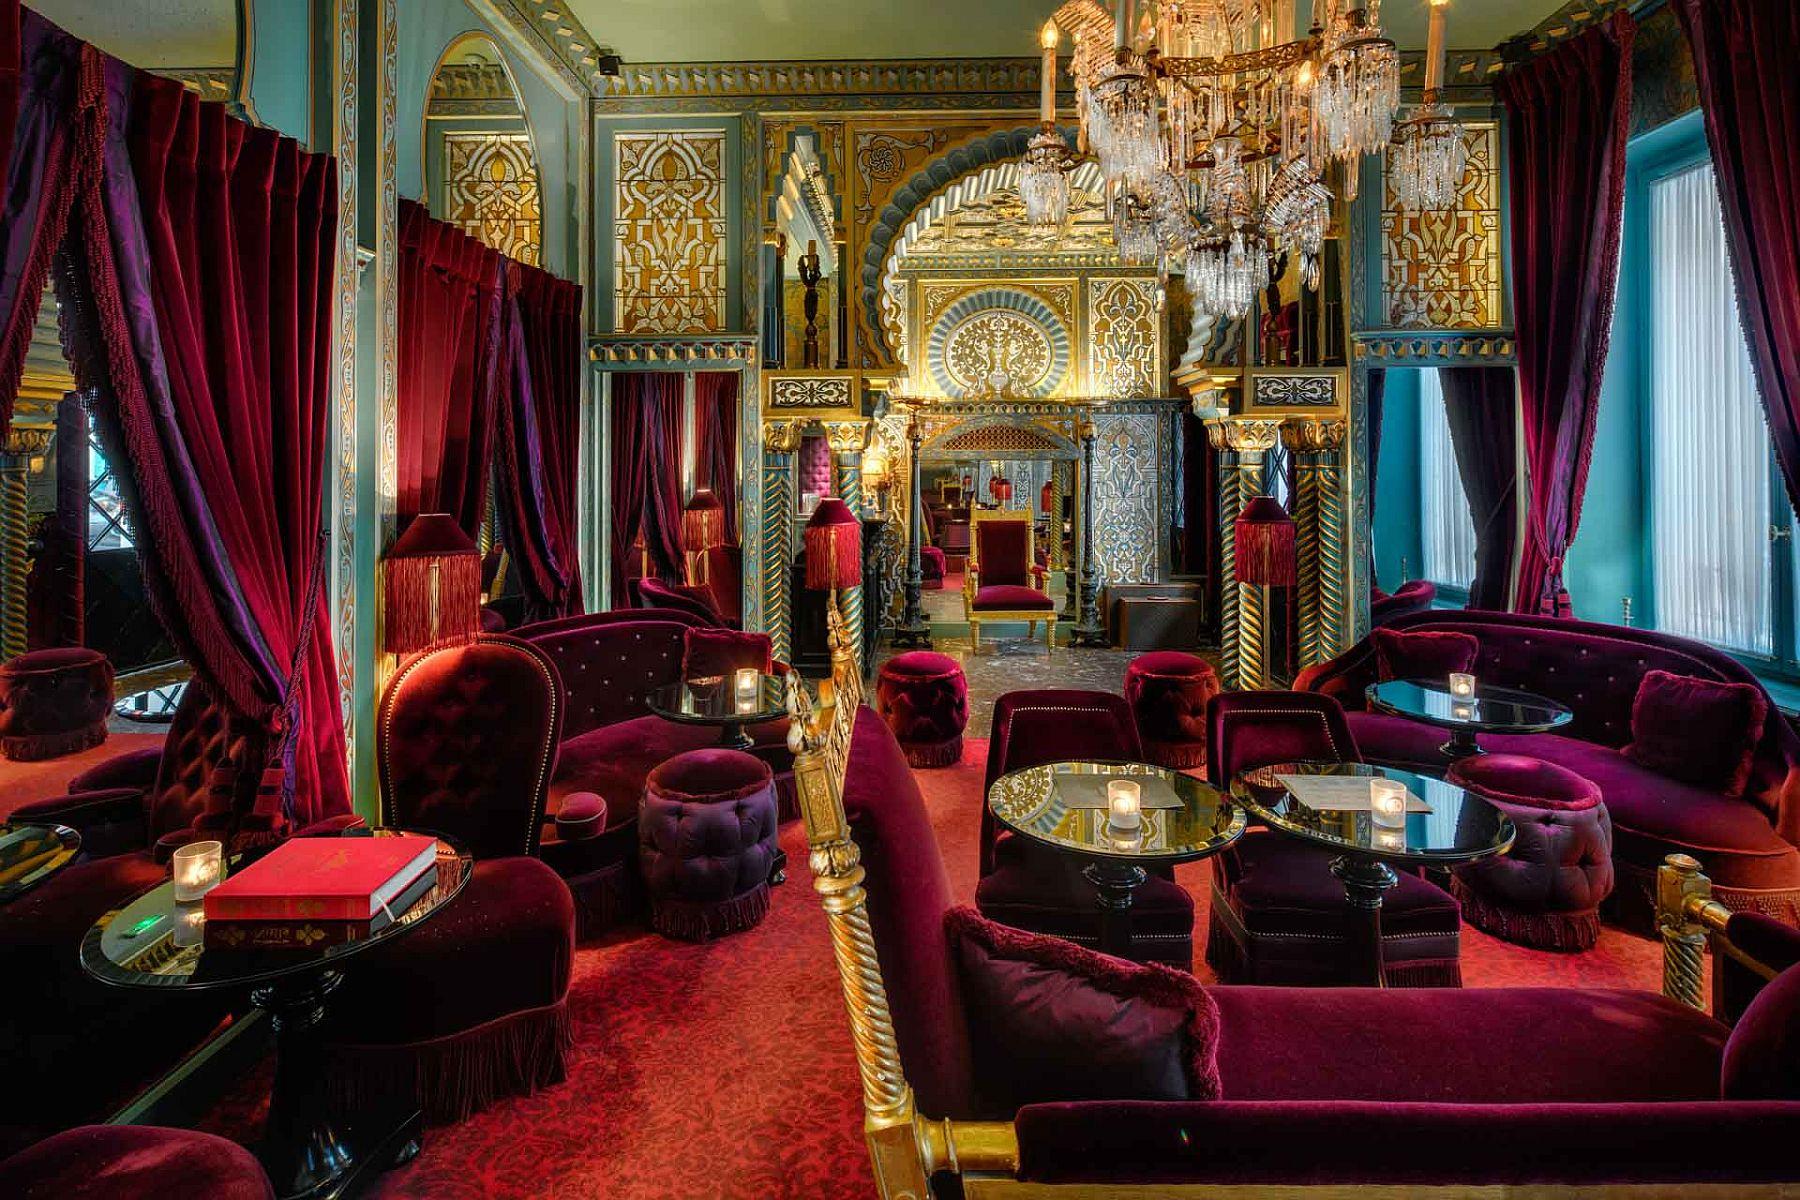 25 best luxury hotels and spas in france. Black Bedroom Furniture Sets. Home Design Ideas